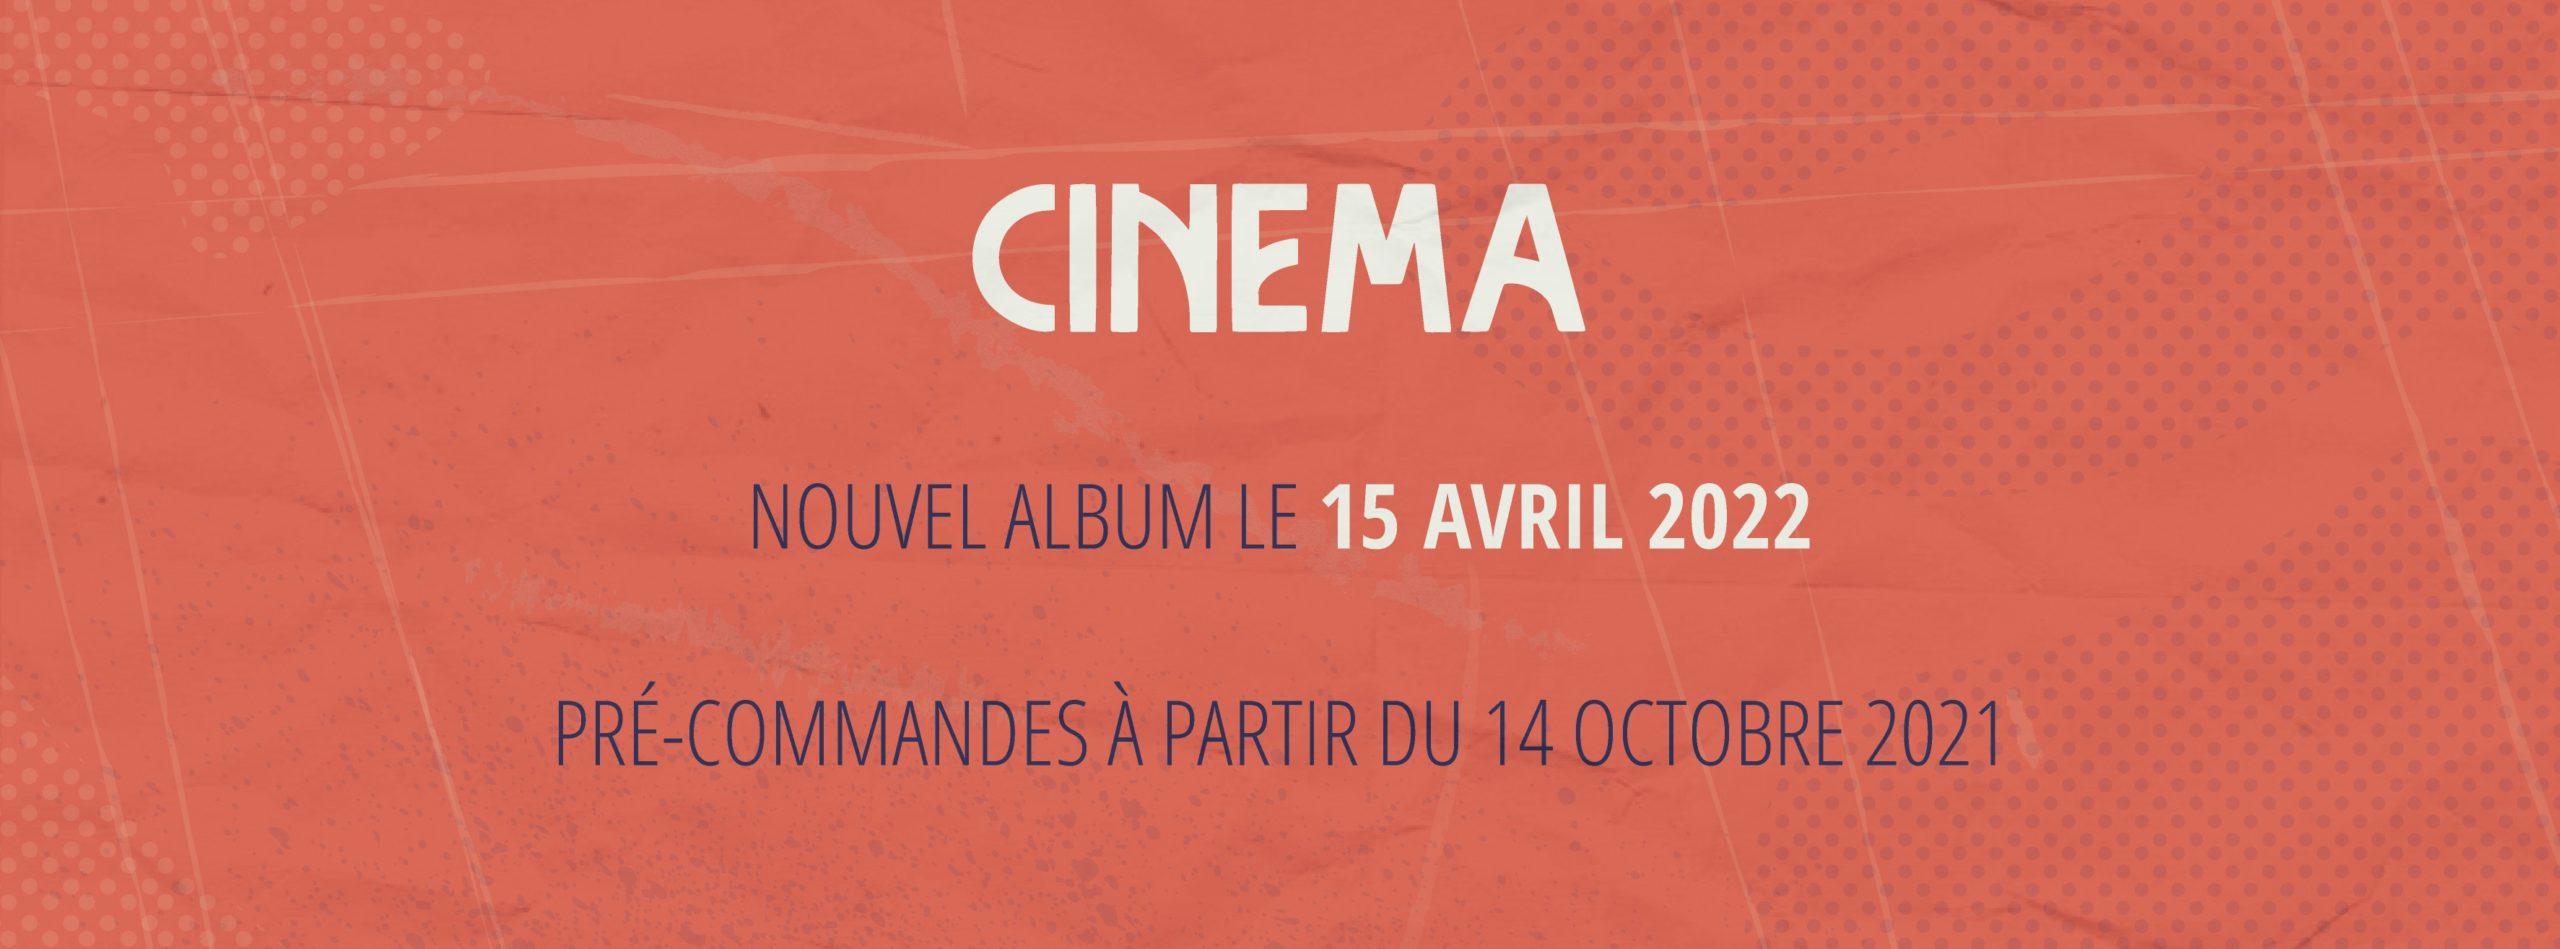 https://www.helloasso.com/associations/faites-donc-ca/collectes/album-cinema